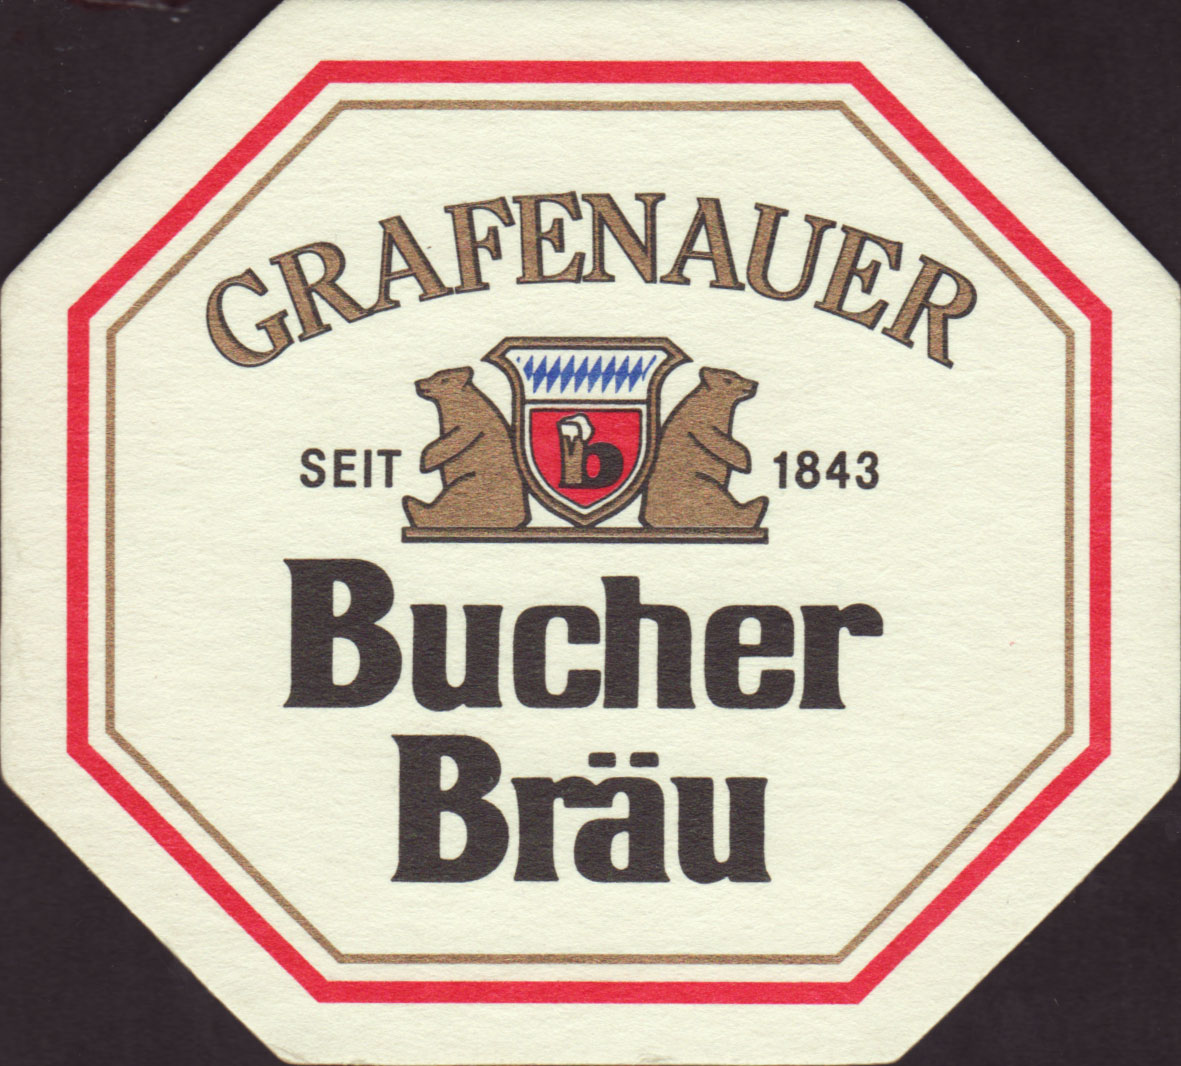 brewery bucher brau grafenau coaster number 3 1. Black Bedroom Furniture Sets. Home Design Ideas